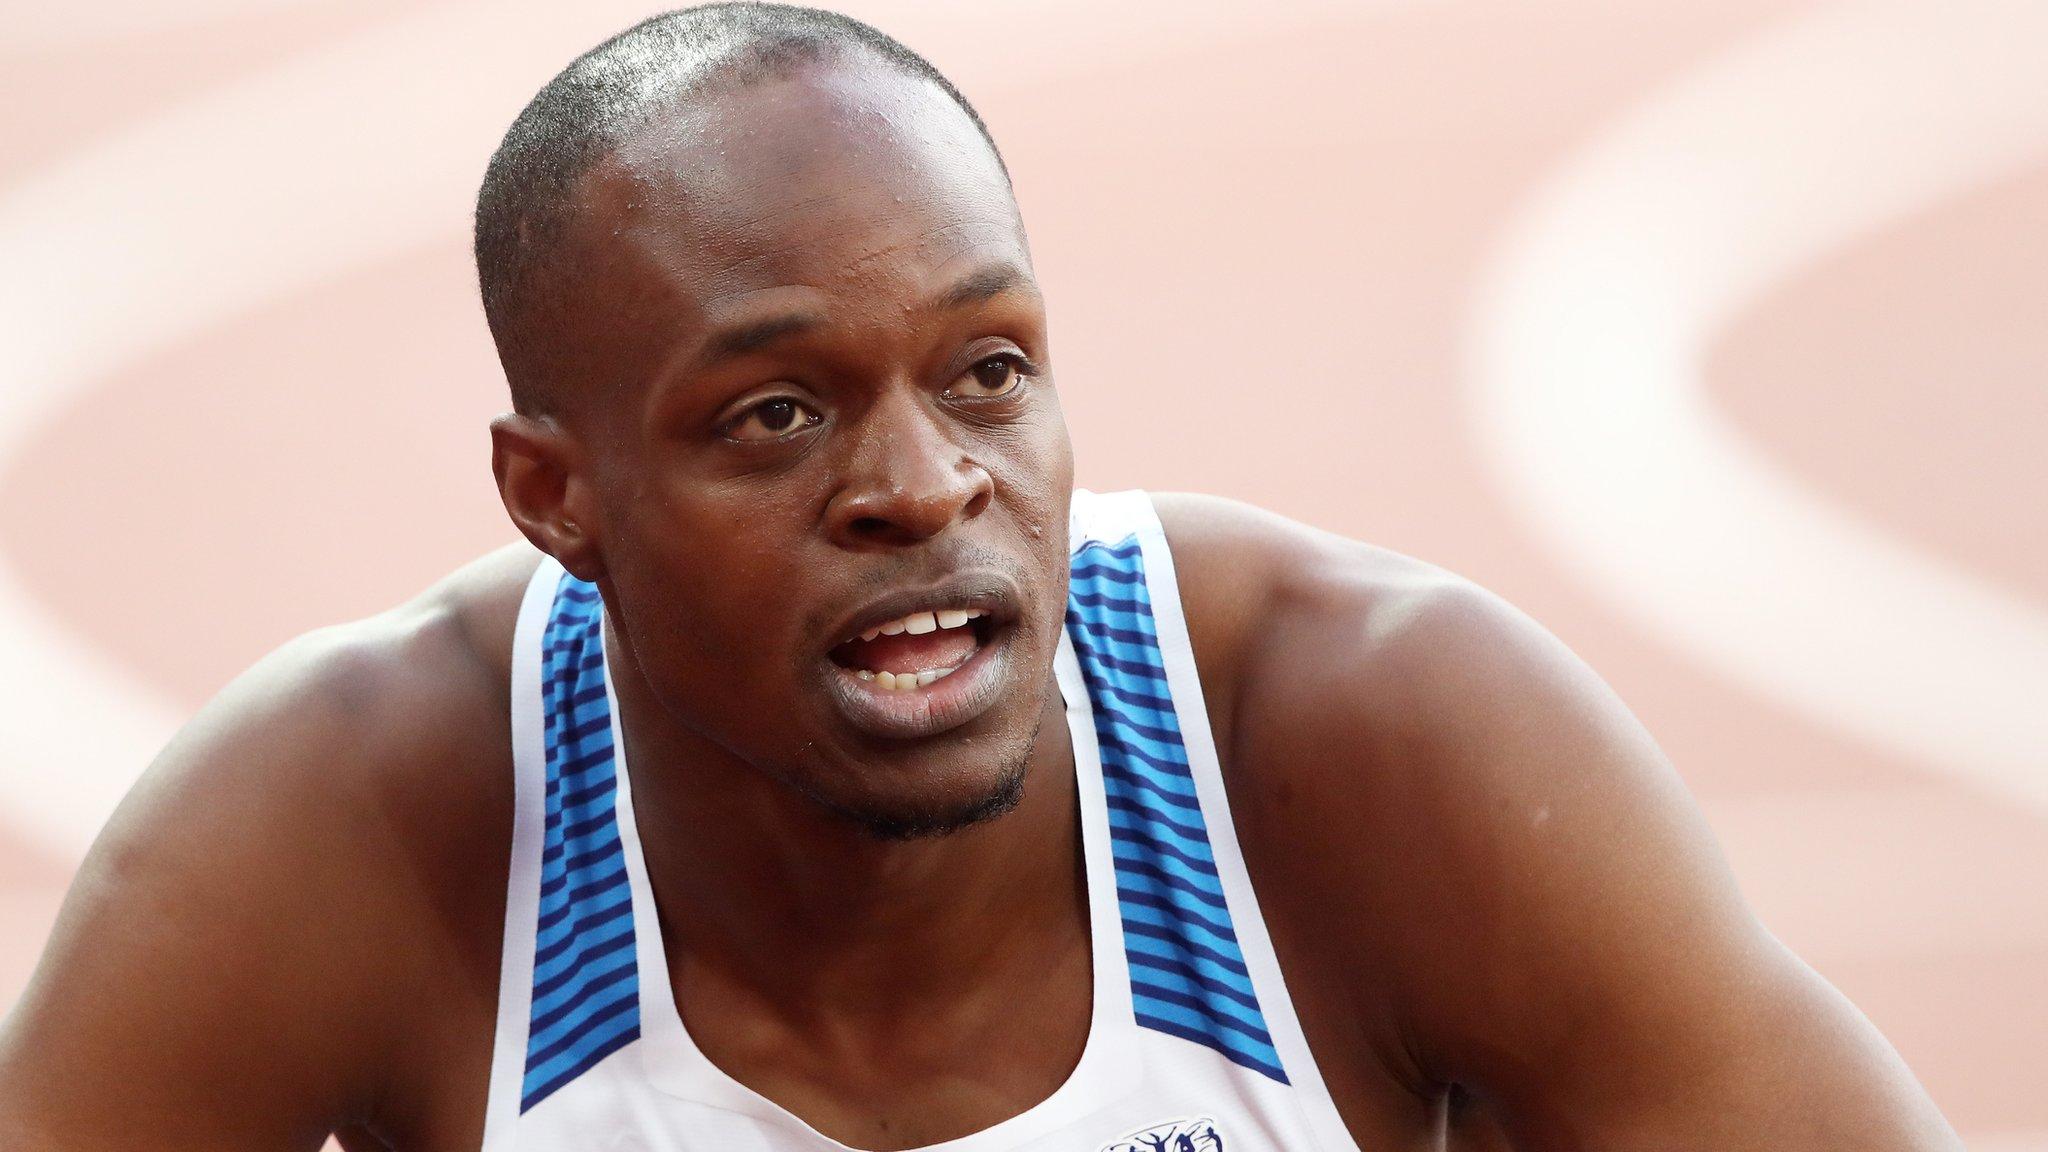 James Dasaolu: British public saved my career, says Olympic sprinter